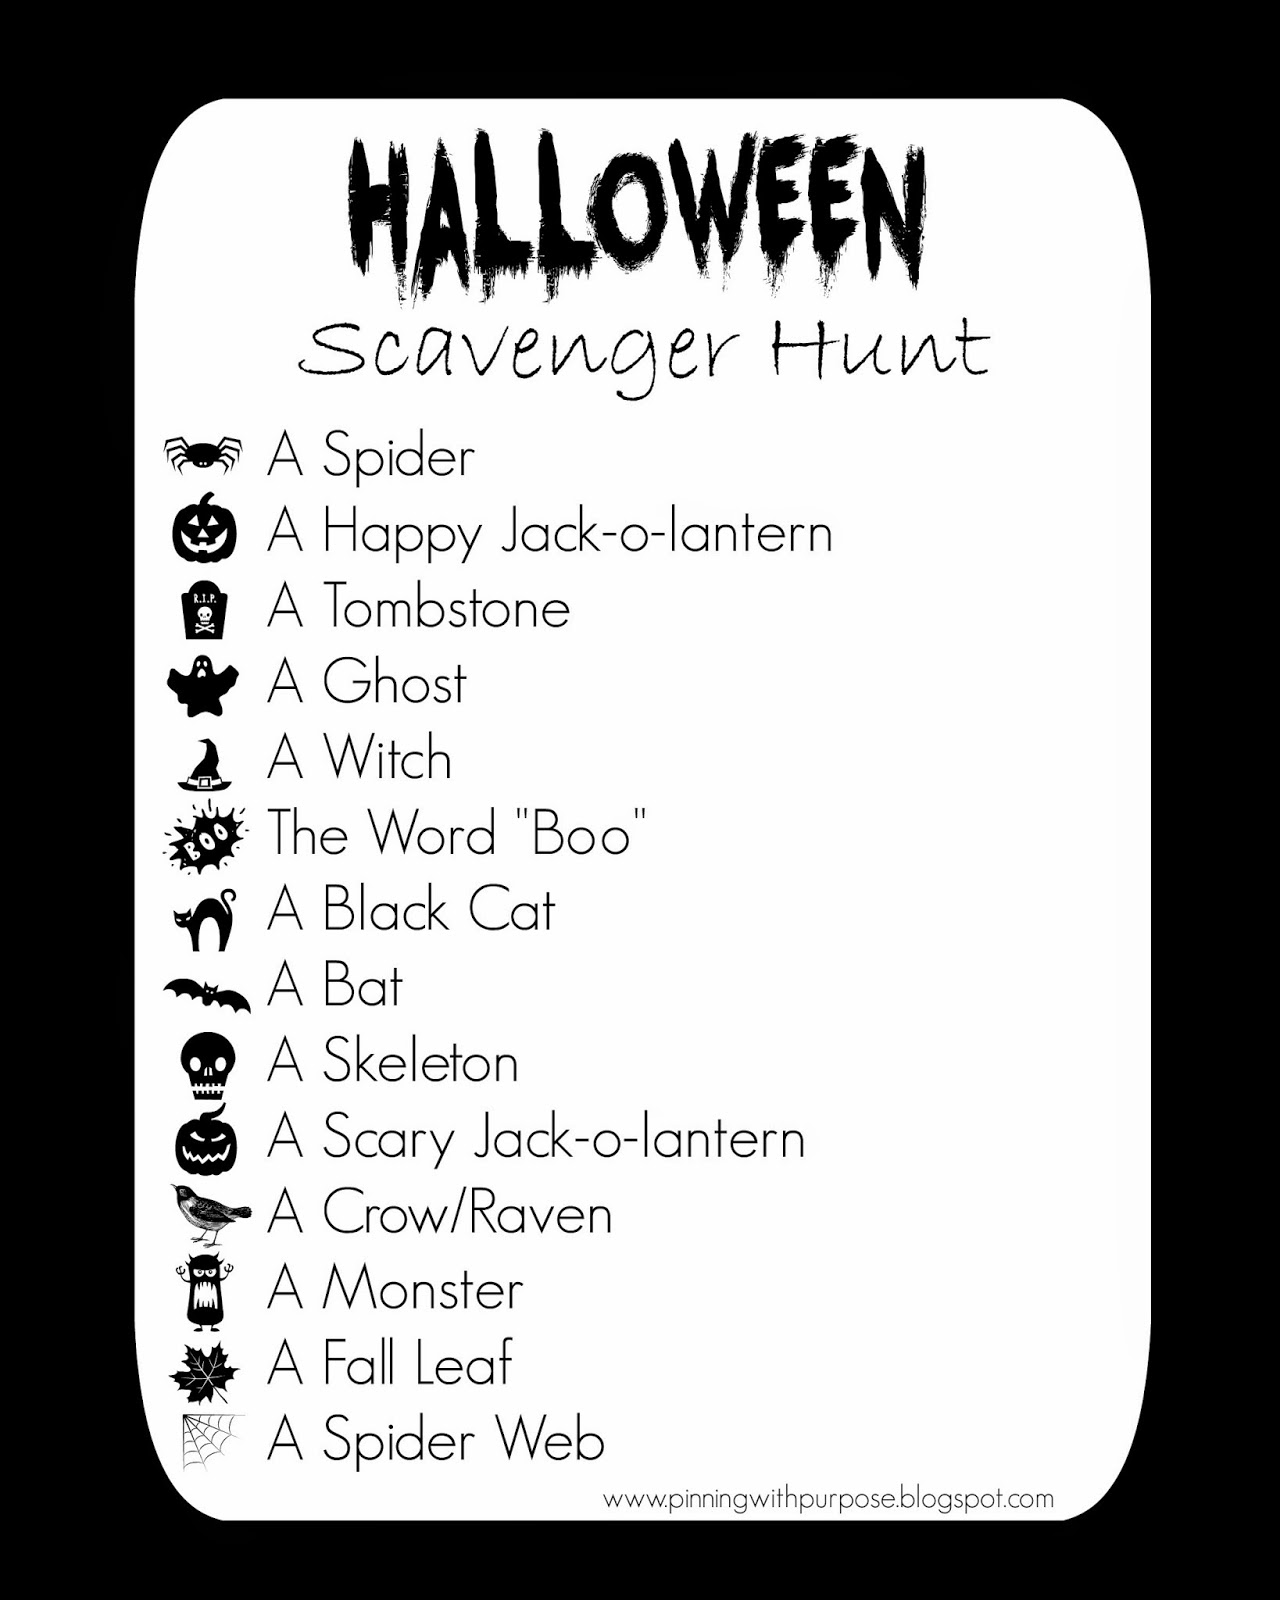 Pinning with Purpose: Neighborhood Halloween Scavenger Hunt